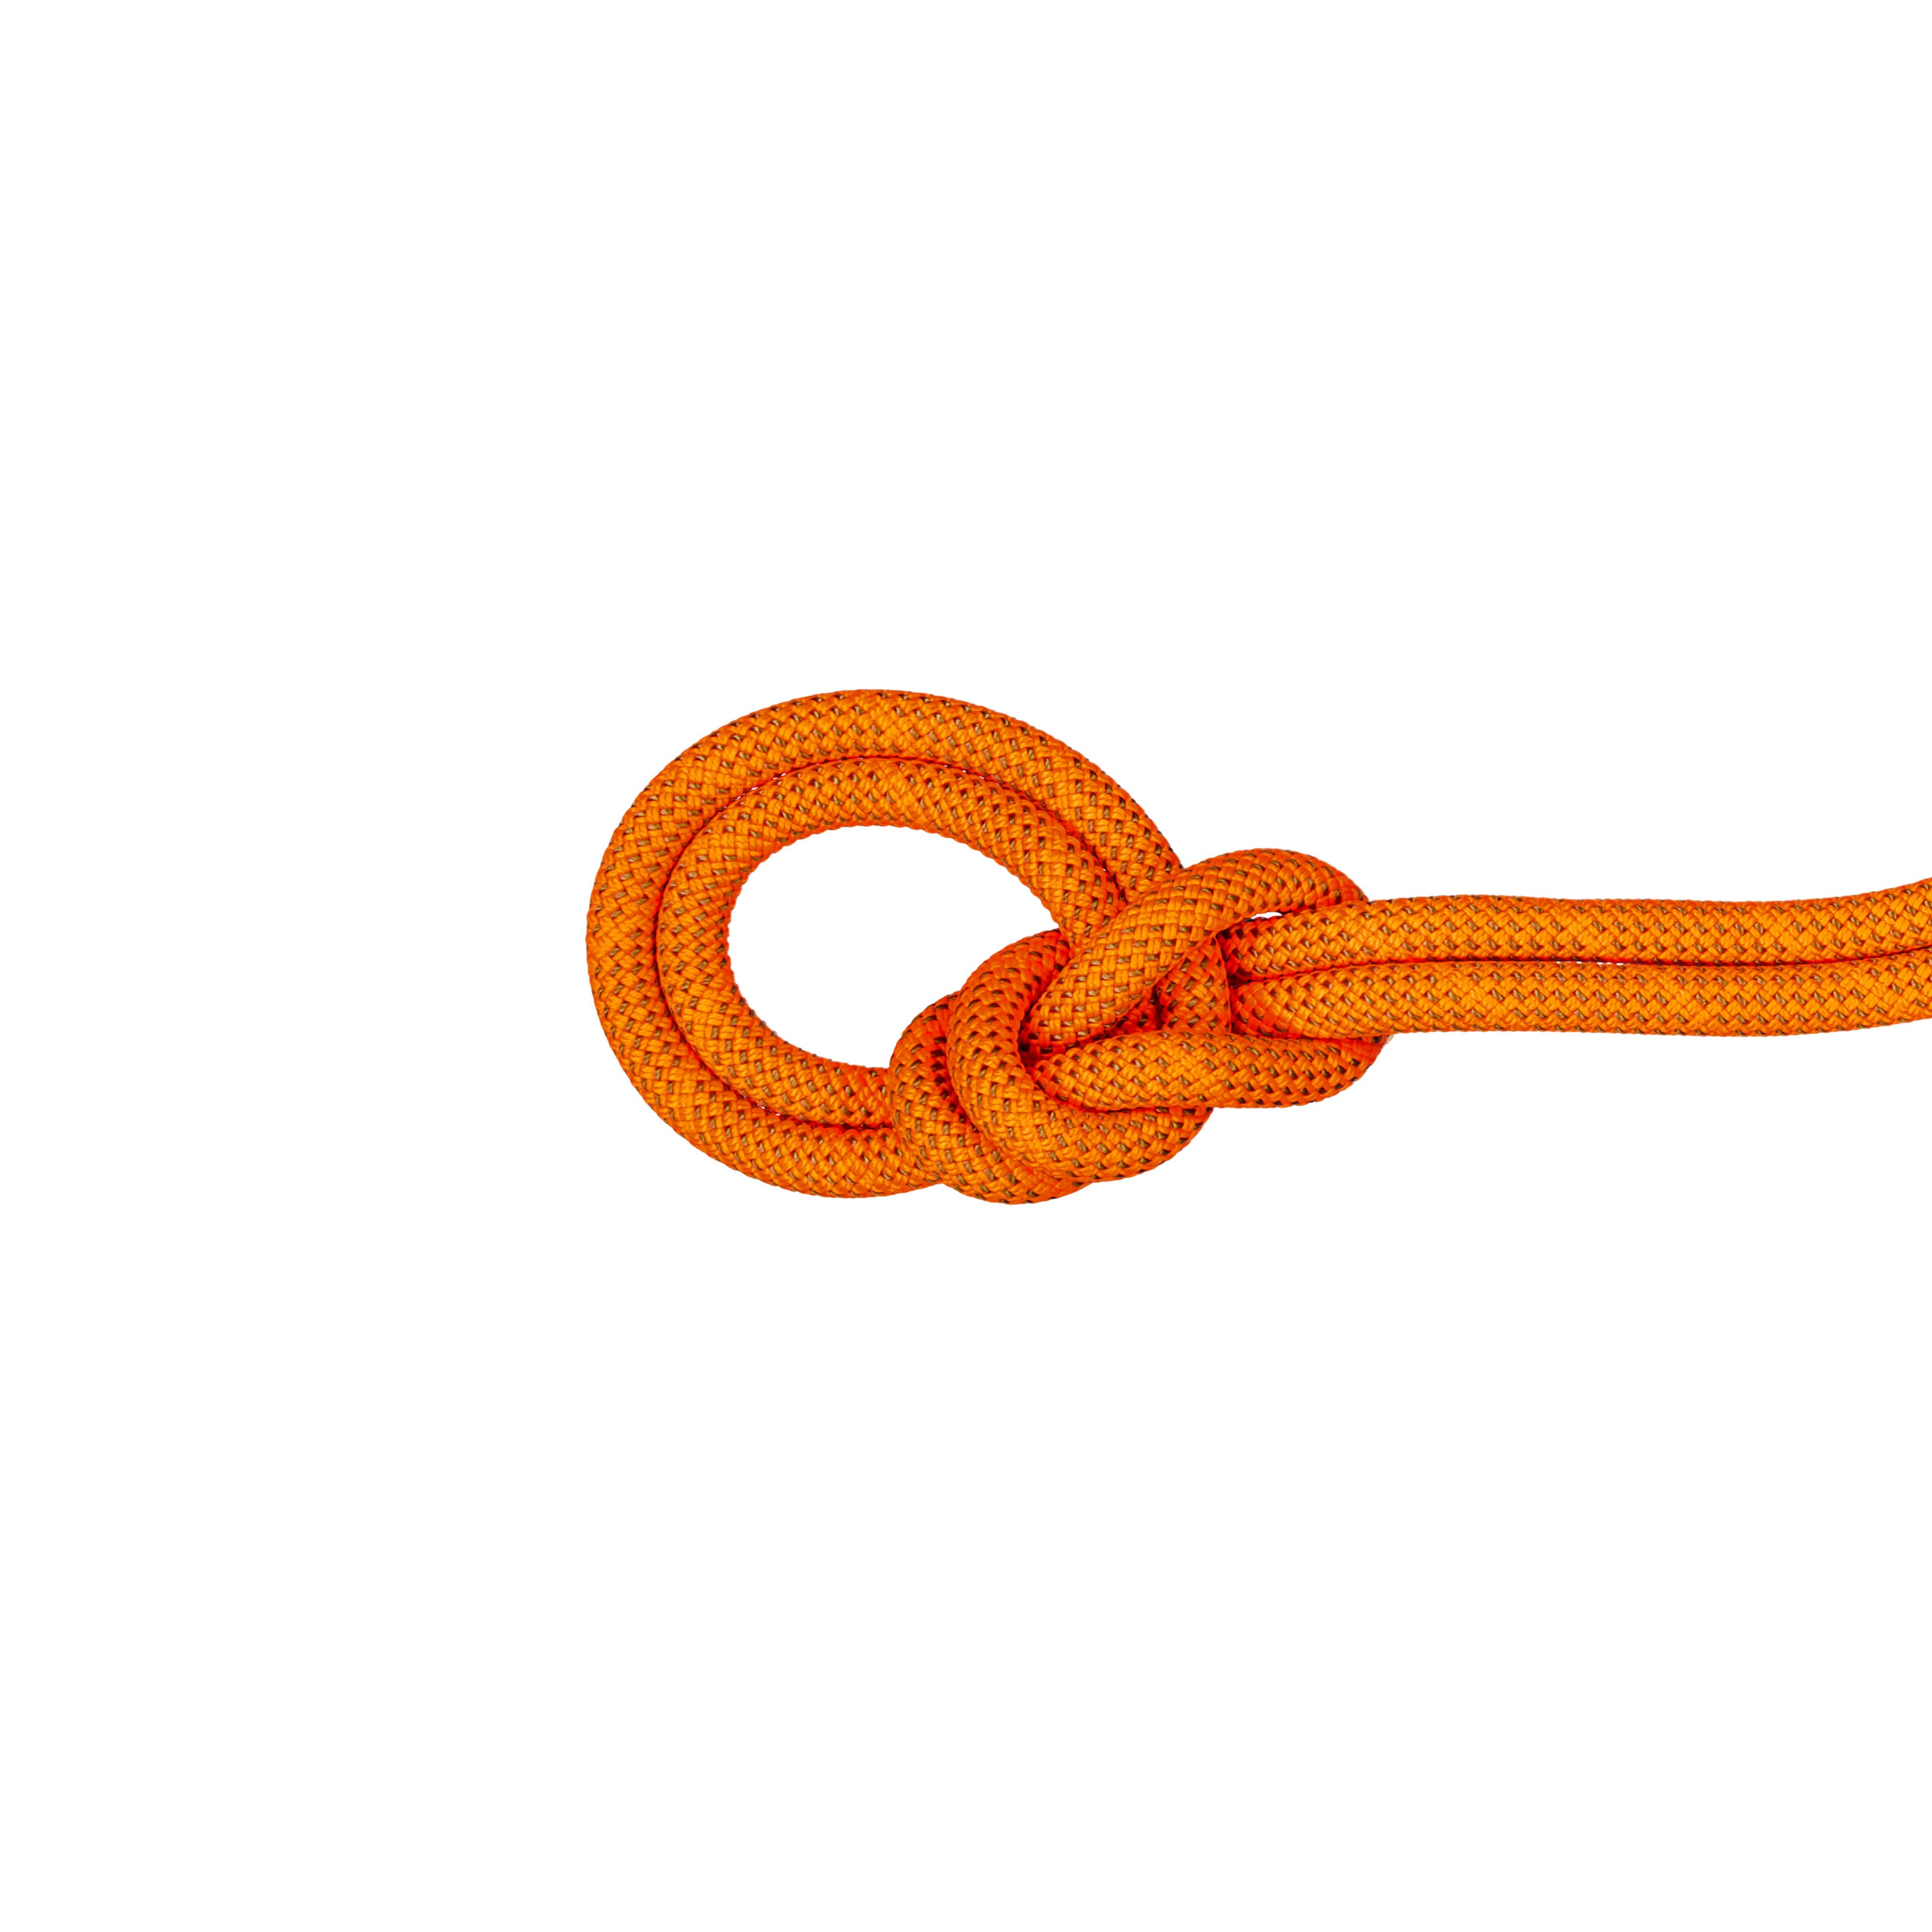 9.8 Crag Dry Rope thumbnail